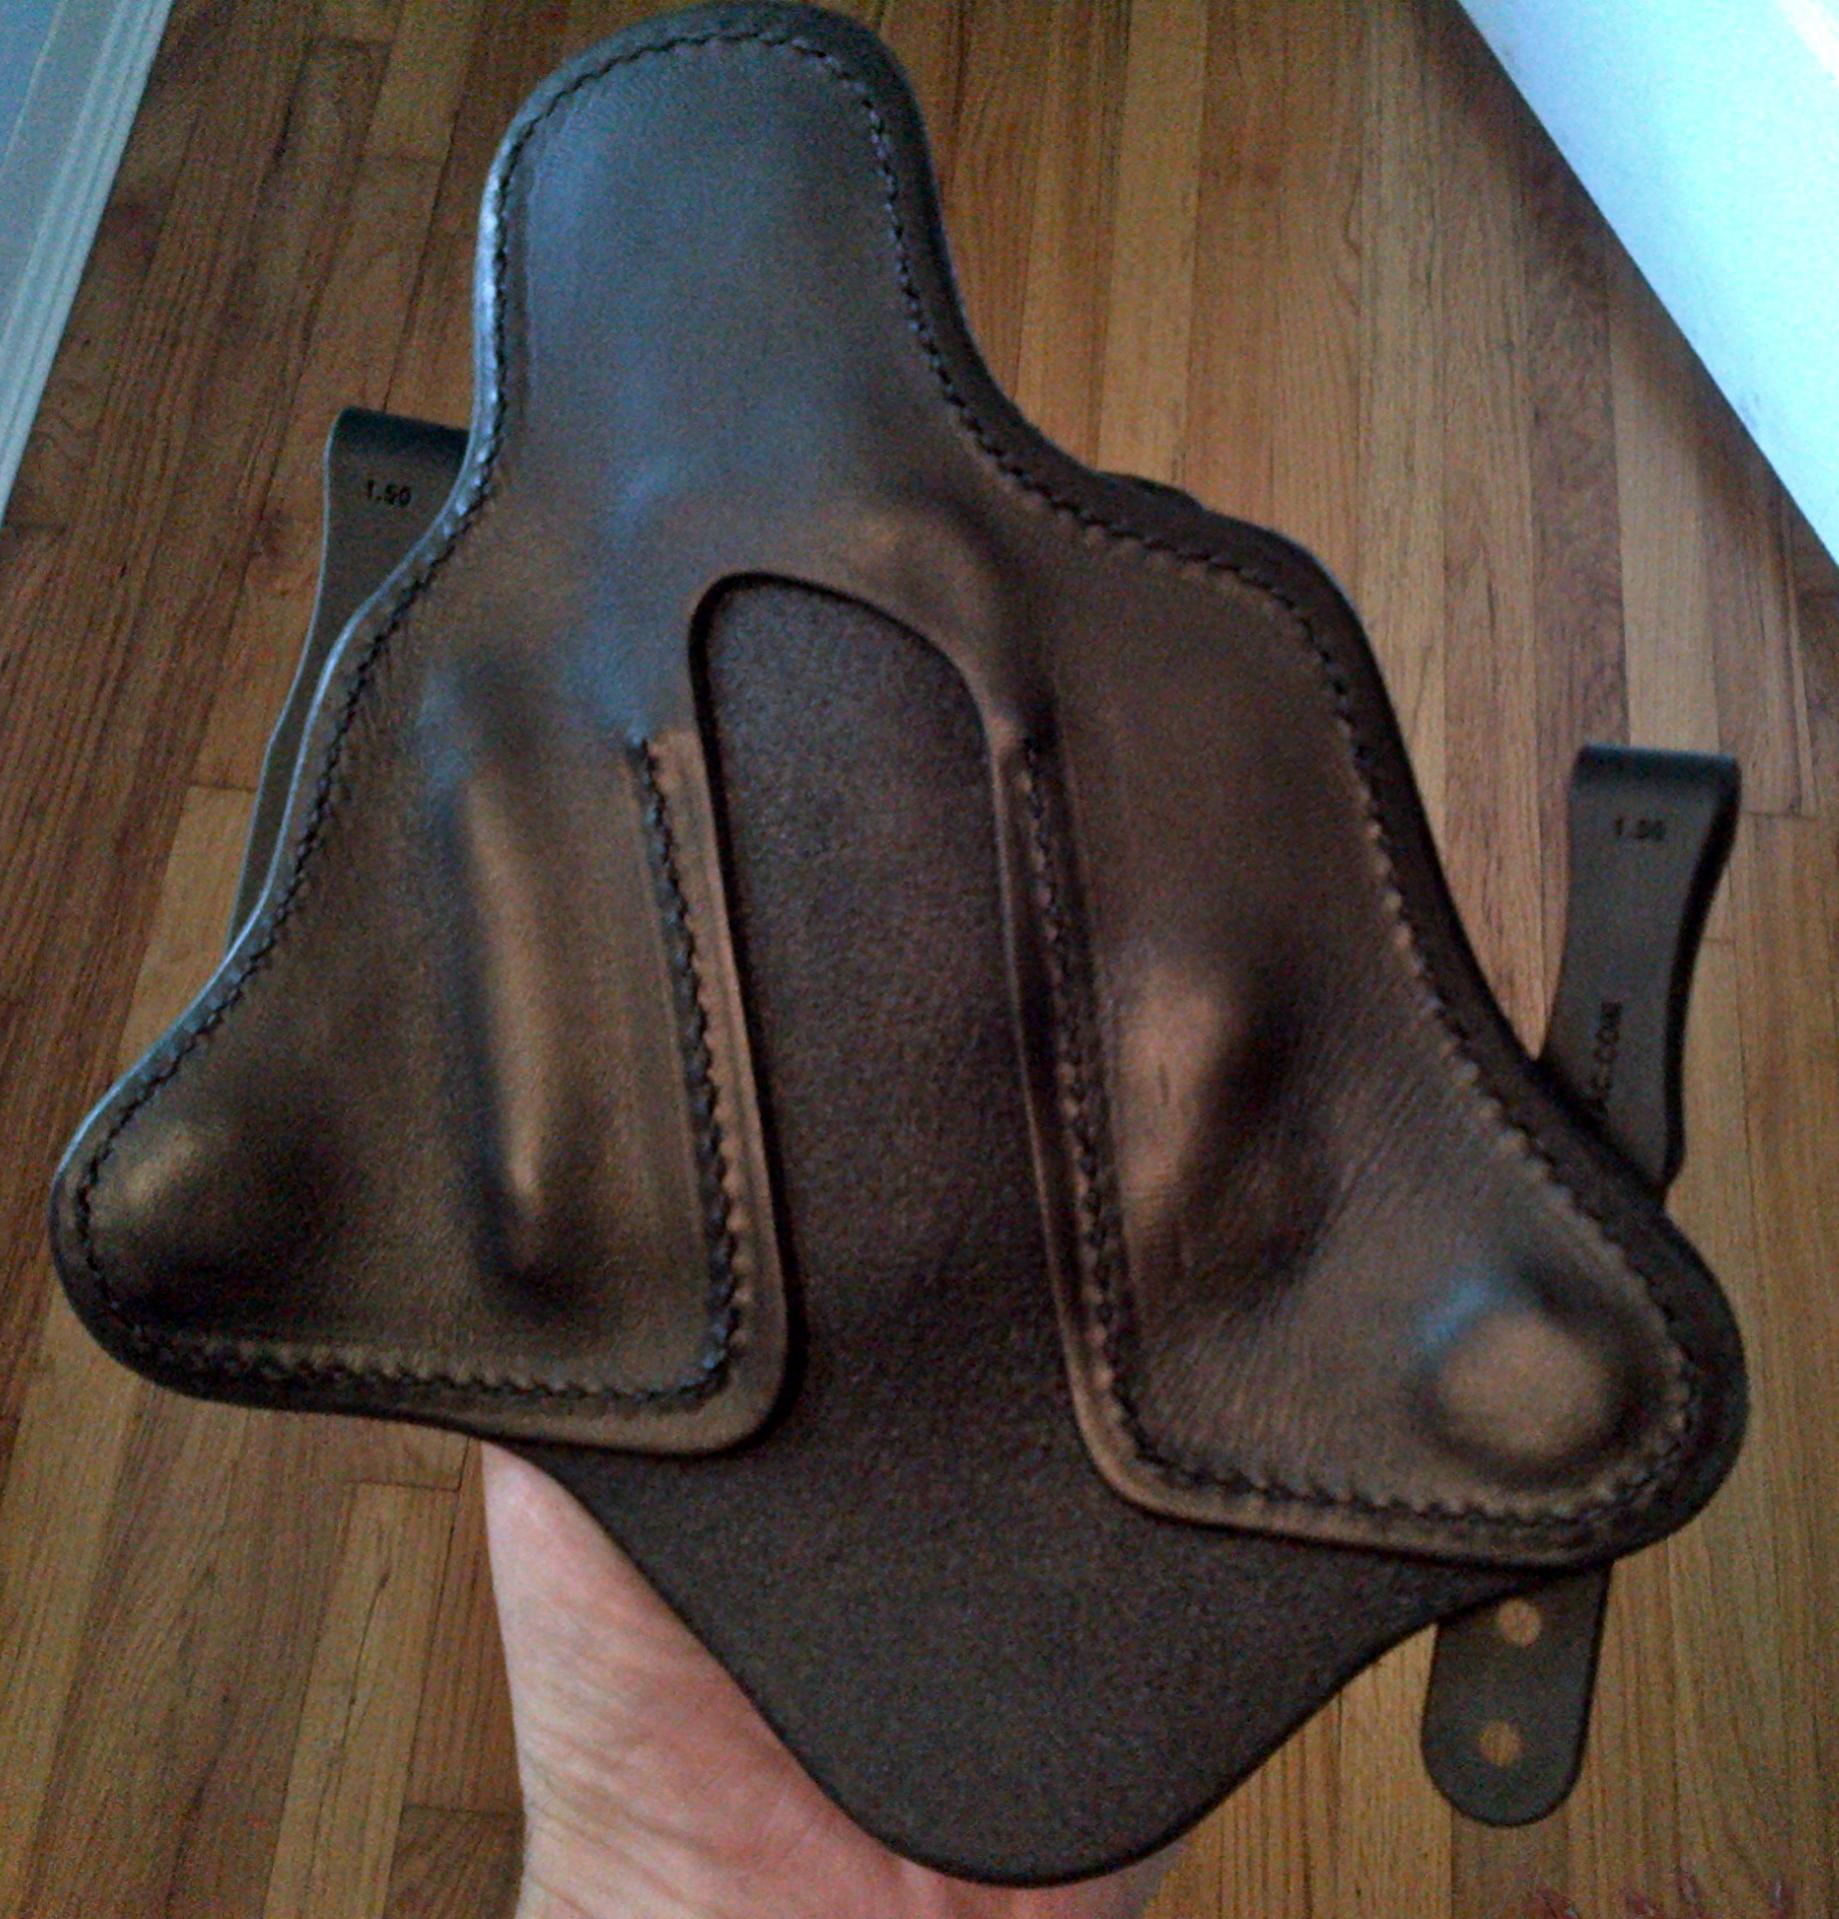 WTS: Like New Comp-Tac Minotaur MTAC for M&P Shield (TX)-img-20120730-00388.jpg